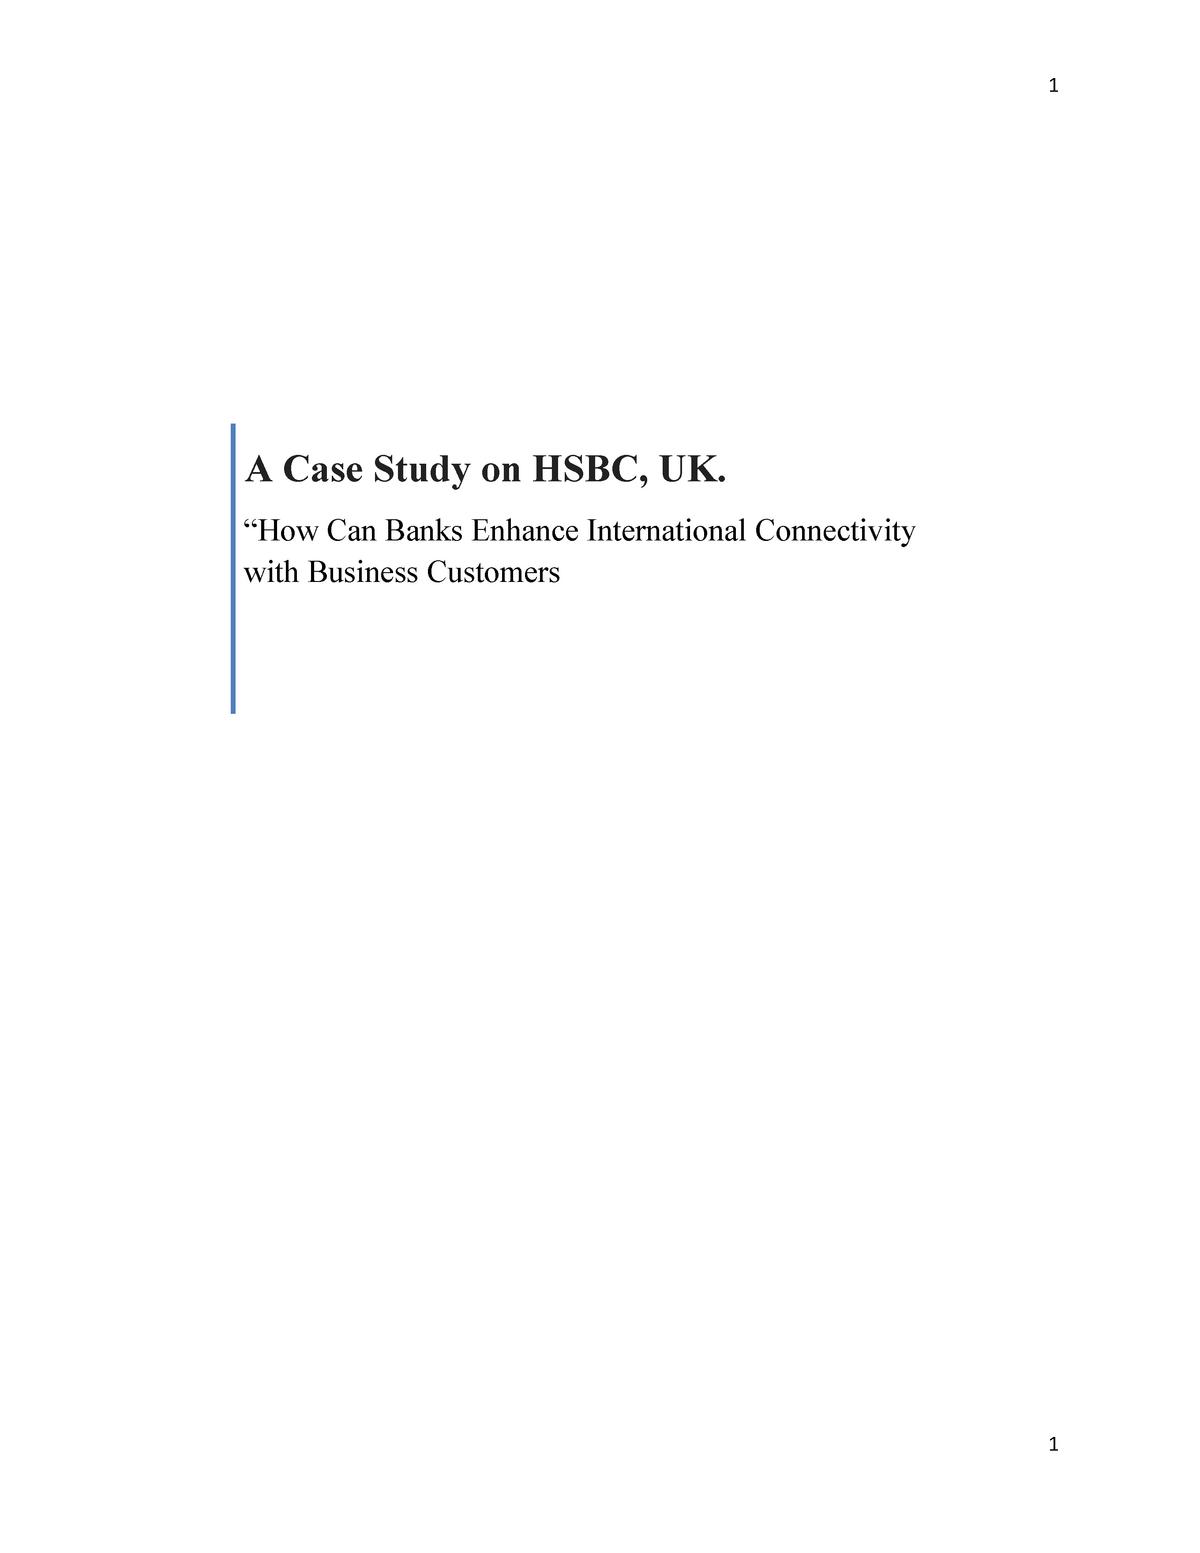 LOLA research proposal on HSBC, UK - BUSN11094: Research